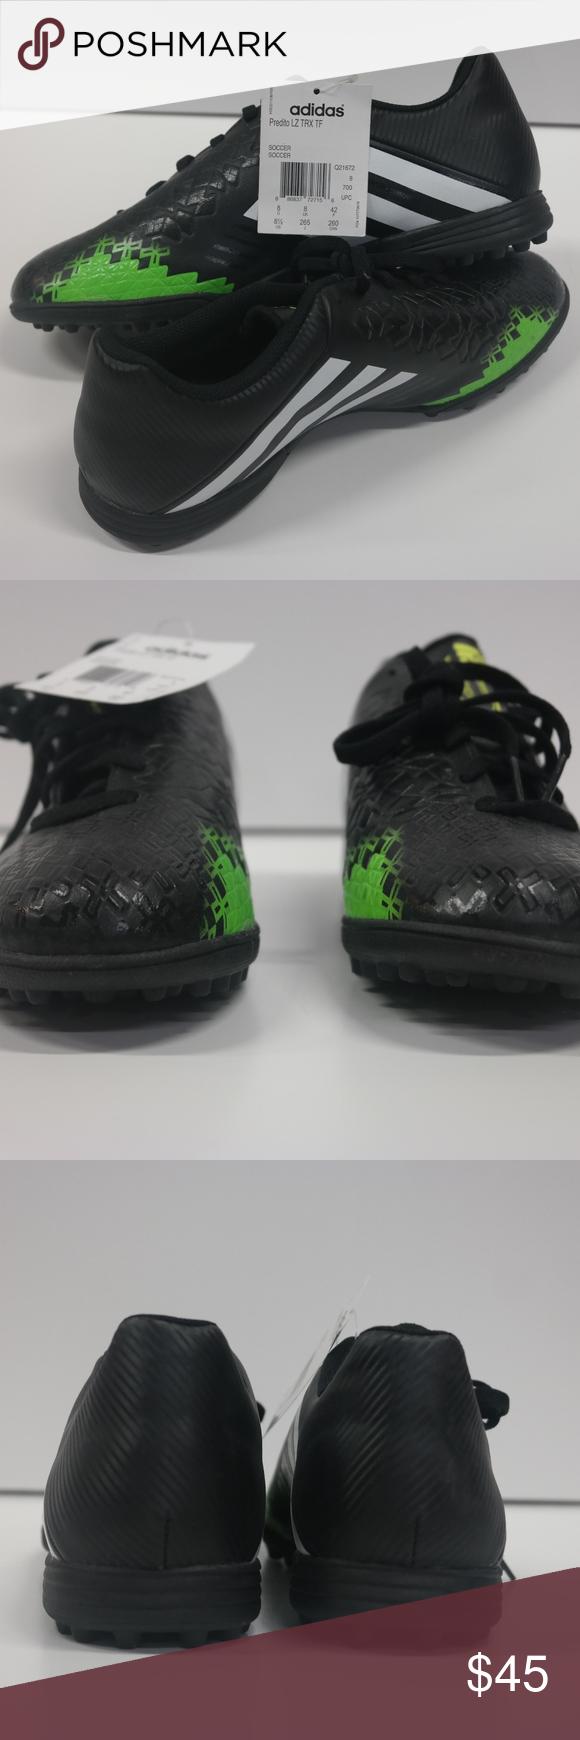 NWT Adidas predito LZ TRX TF negro Turf cleats Pinterest